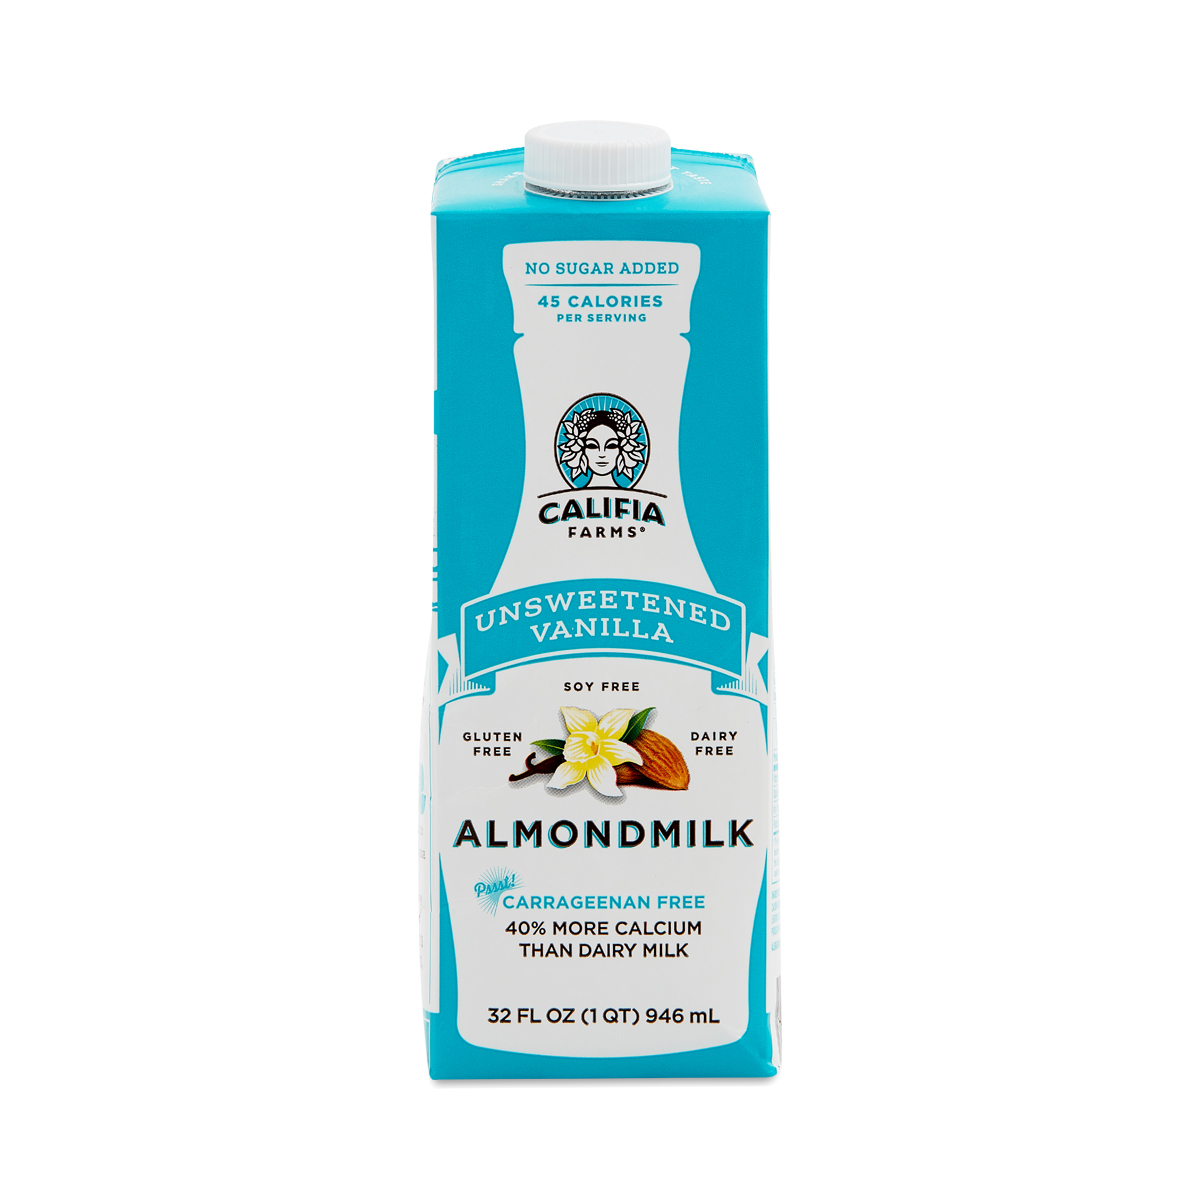 Califia Farms Shelf Stable Almond Milk, Unsweetened Vanilla 32 oz carton